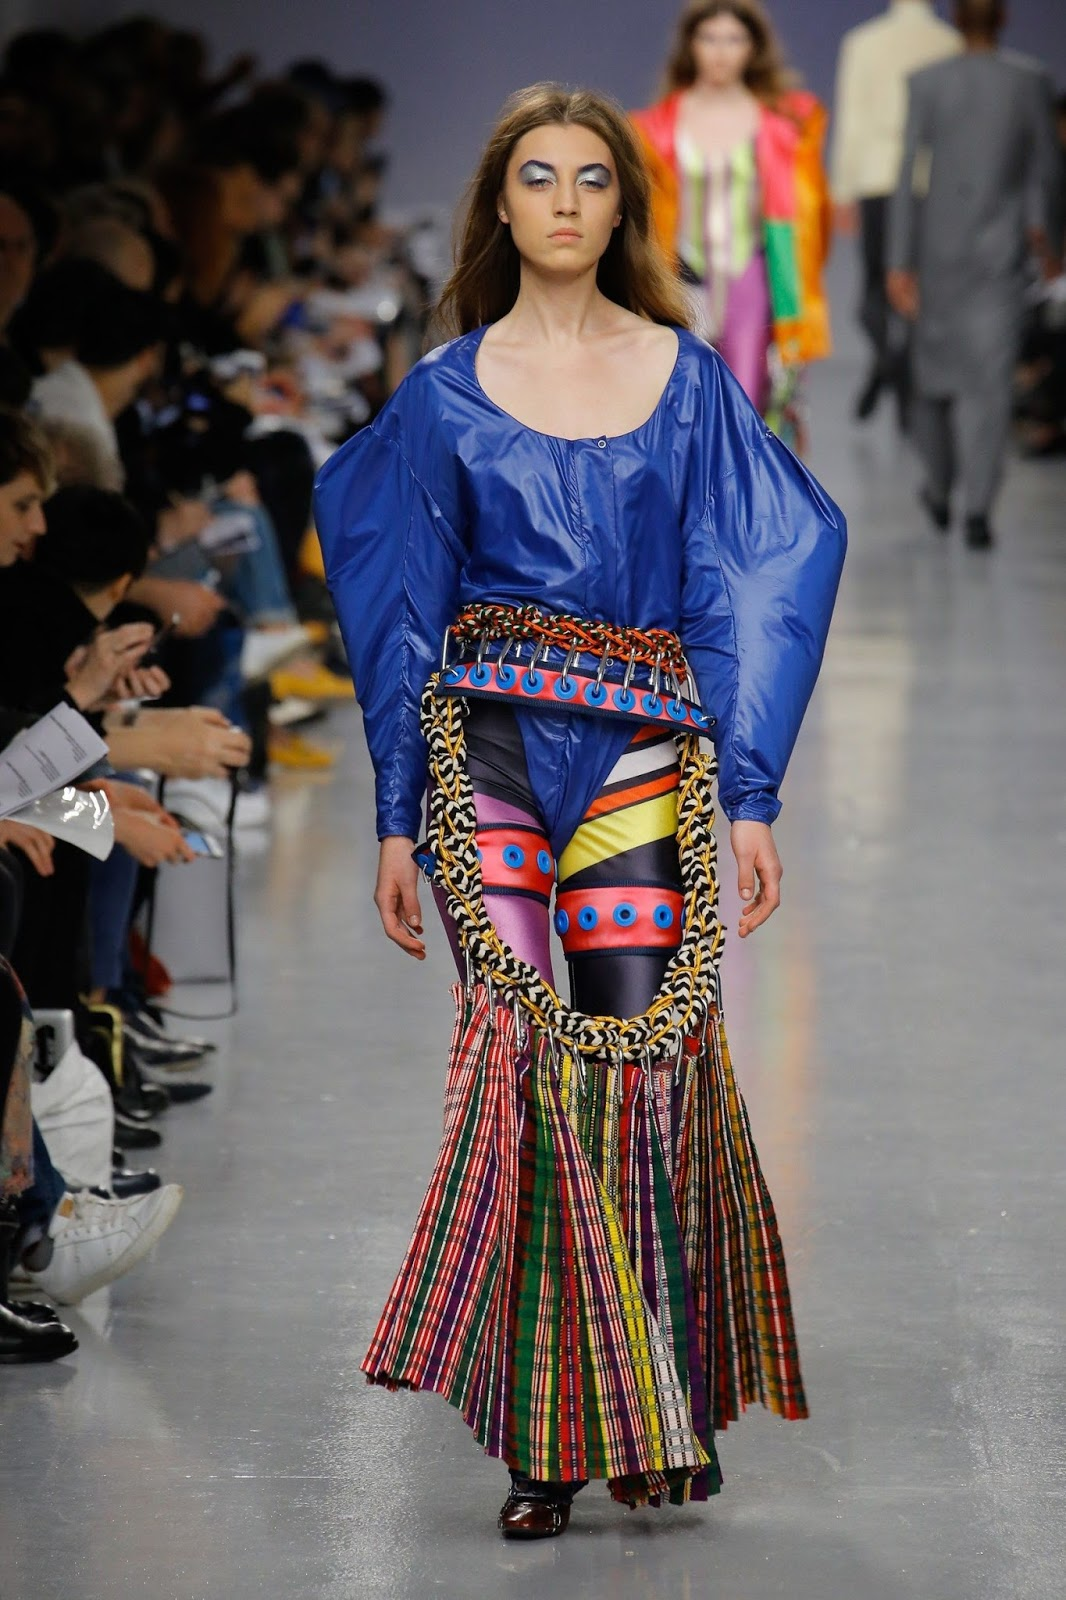 Blogger Height of fashion thesaurus